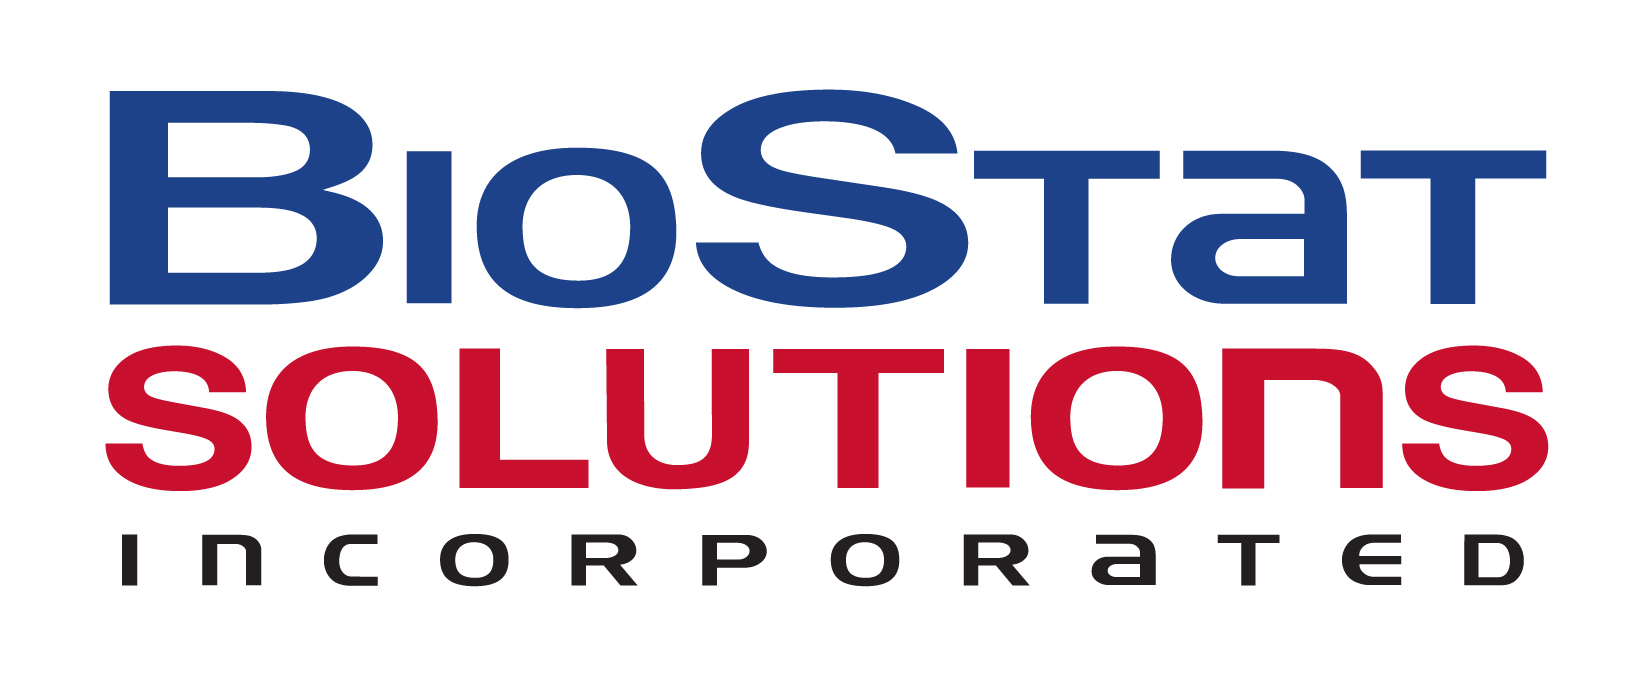 BioStat Solutions, Inc. Promotes Dr. Lin Li to Senior Director of Scientific Operations